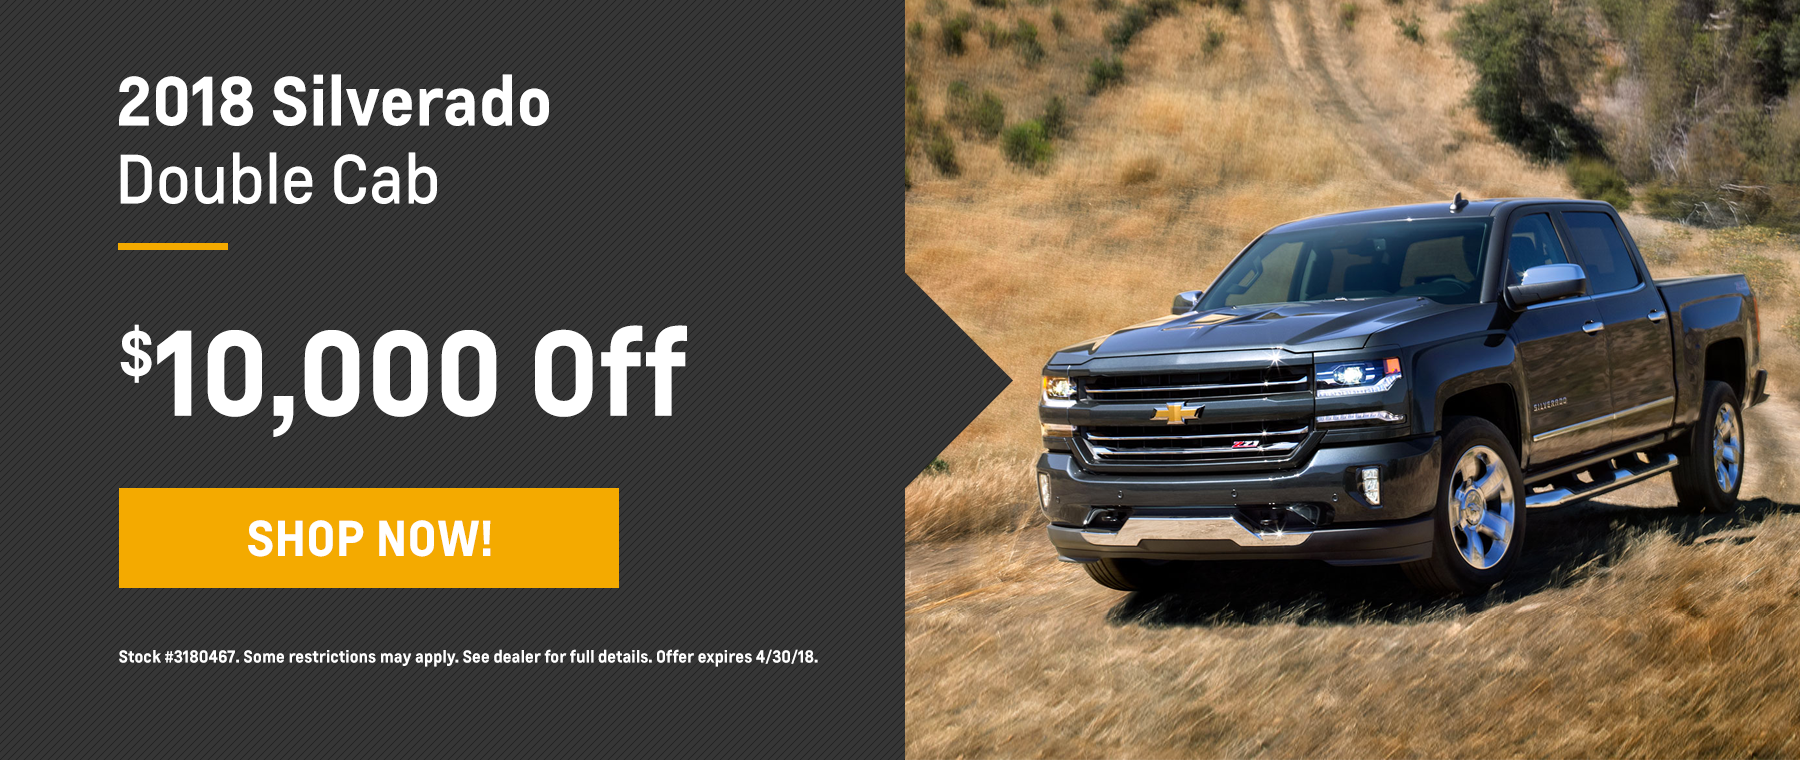 Silverado Biggers Chevrolet April Offer Homepage